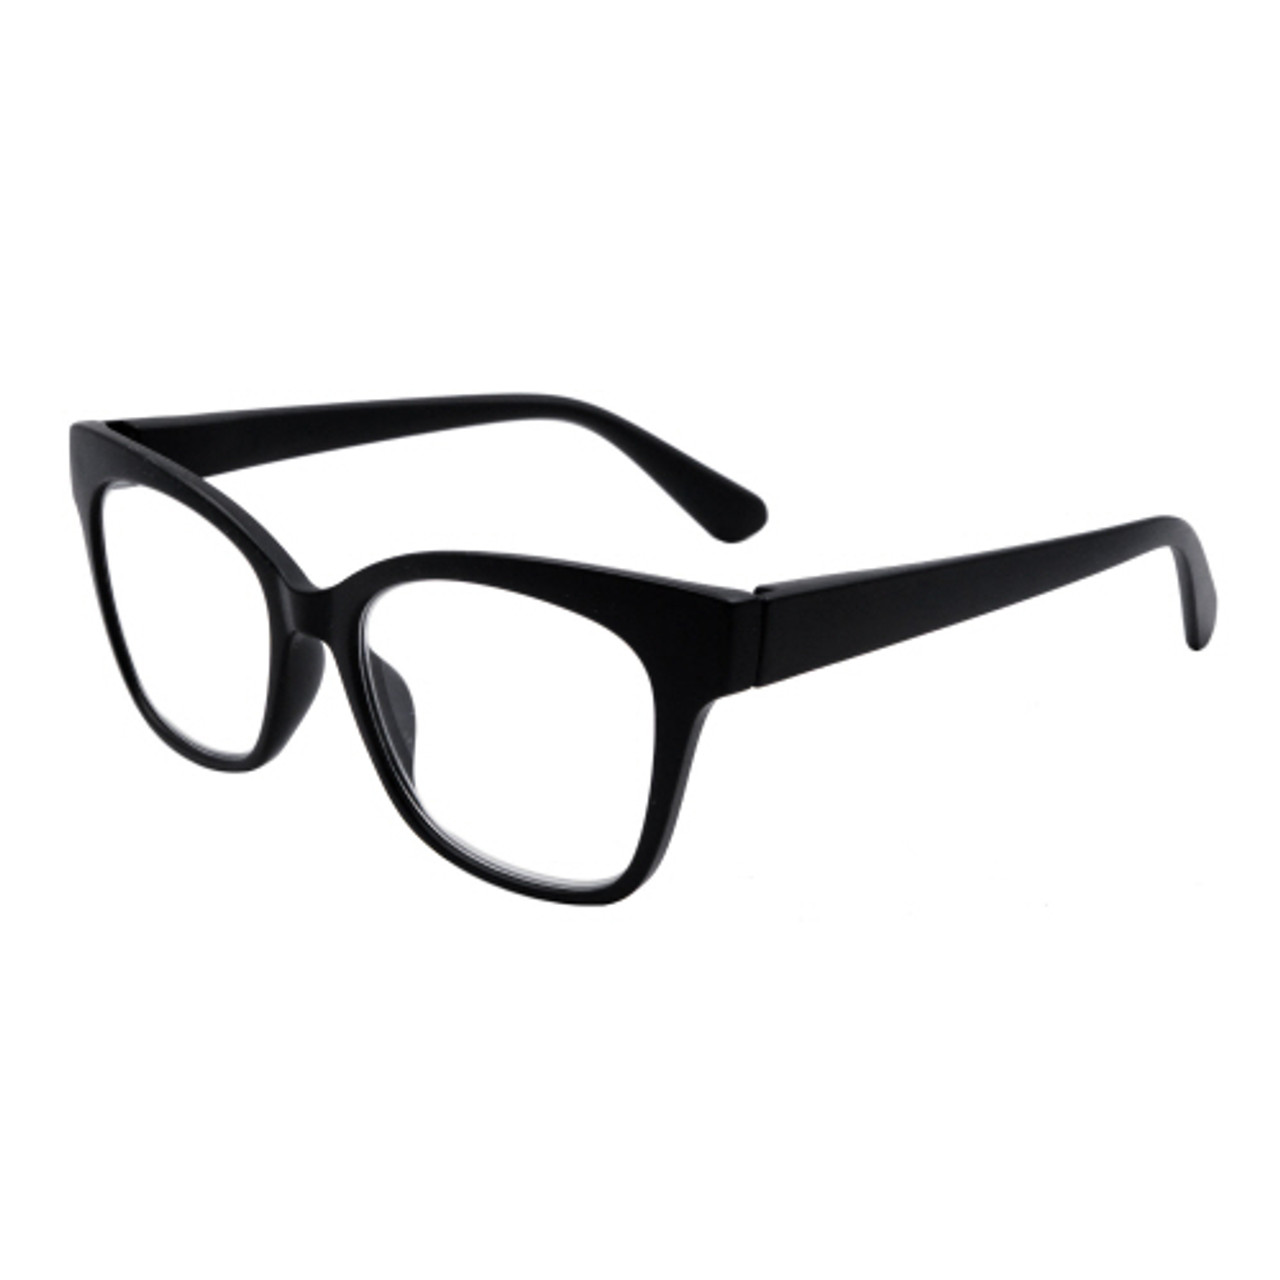 Computer Glasses - Kat Black Assorted Power